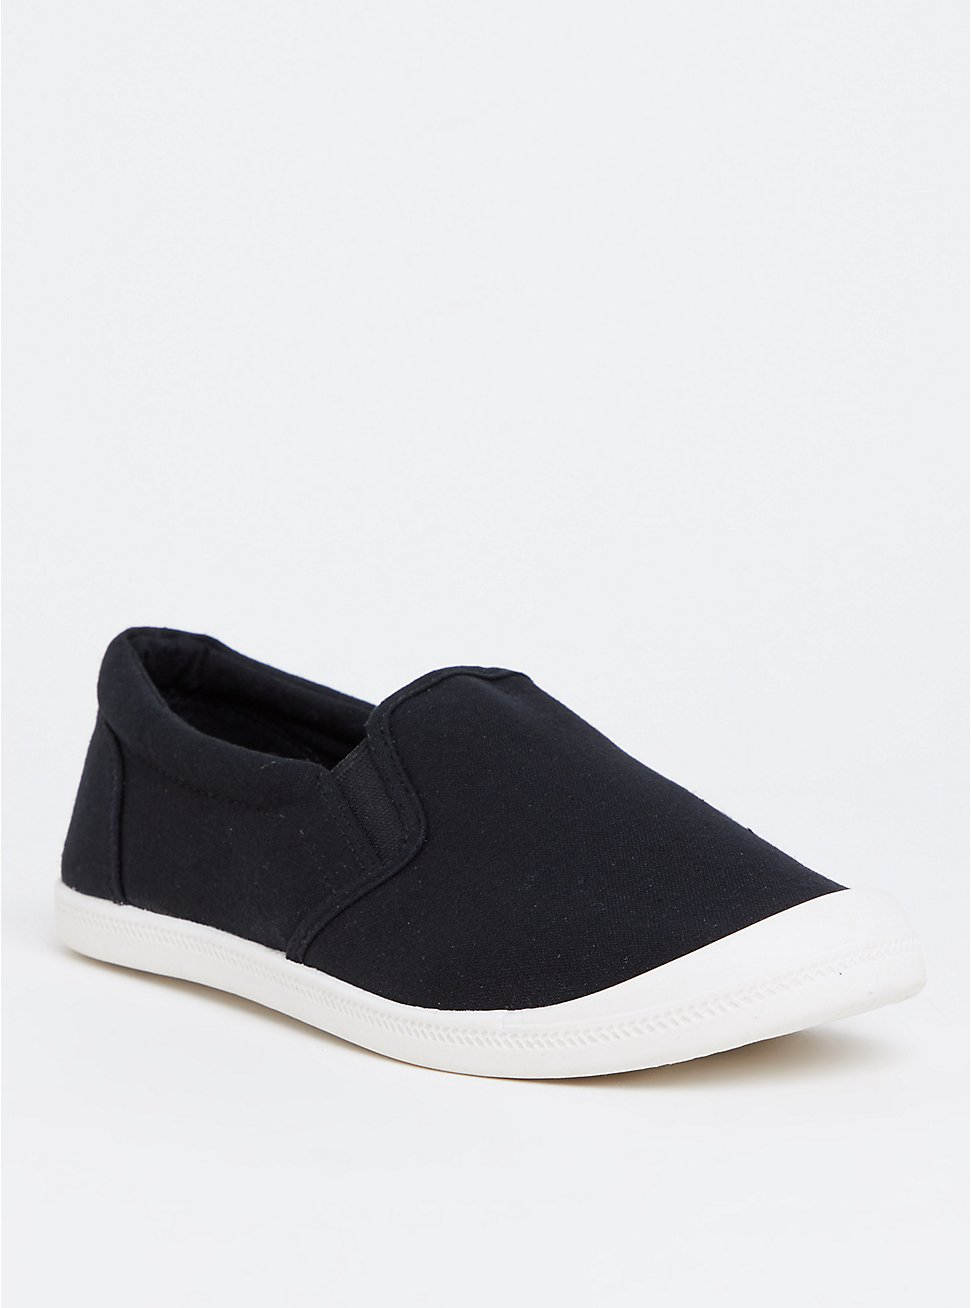 Plus Size Black Cotton-Blend Sneaker (WW), BLACK, hi-res